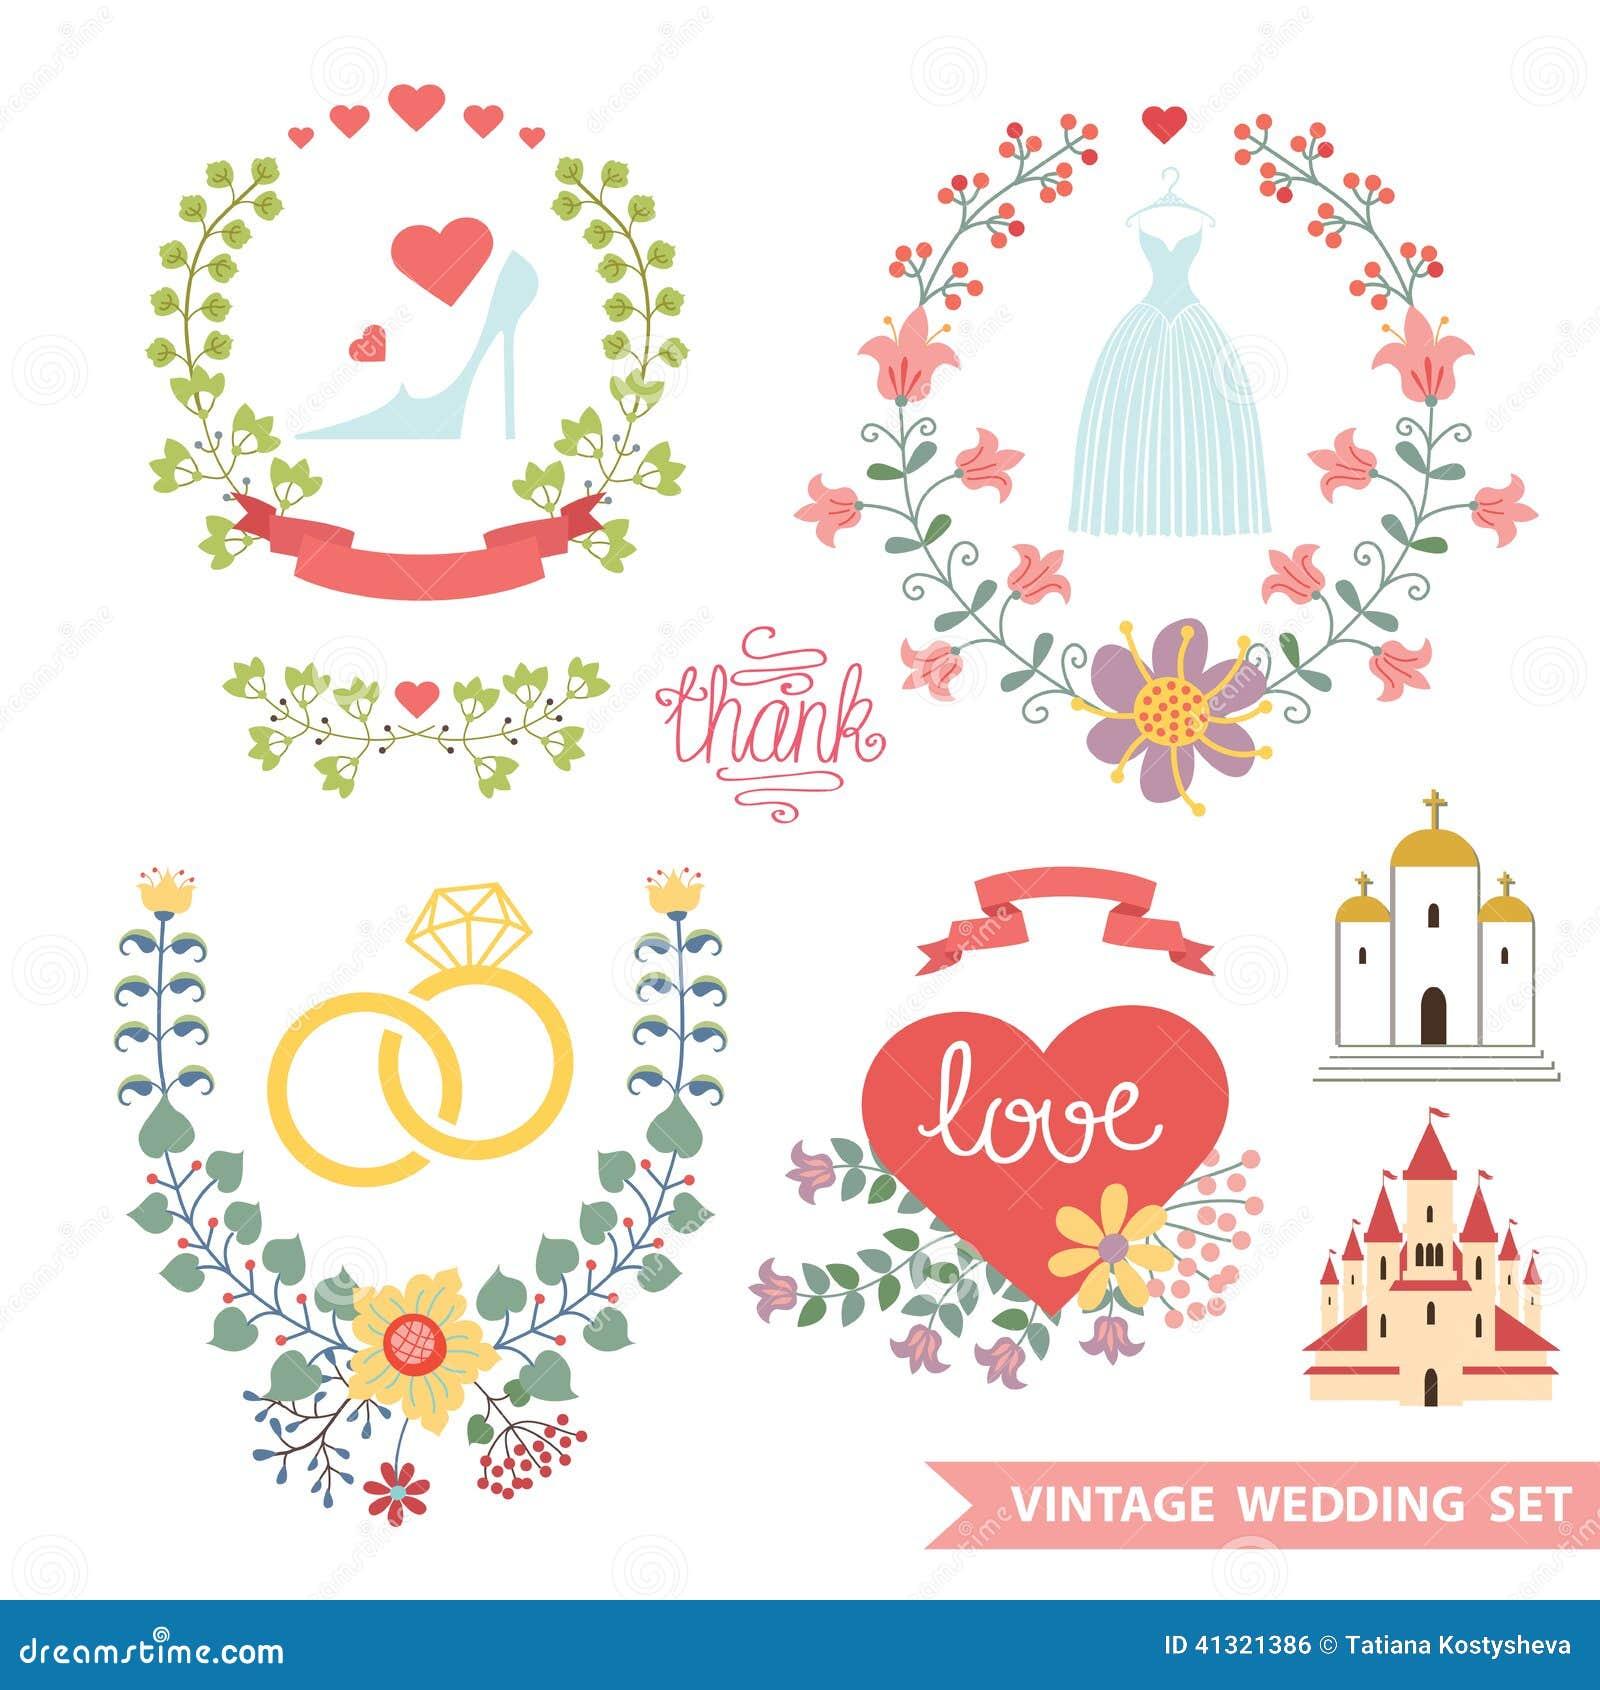 Vintage Floral Set With Wedding Items Stock Illustration